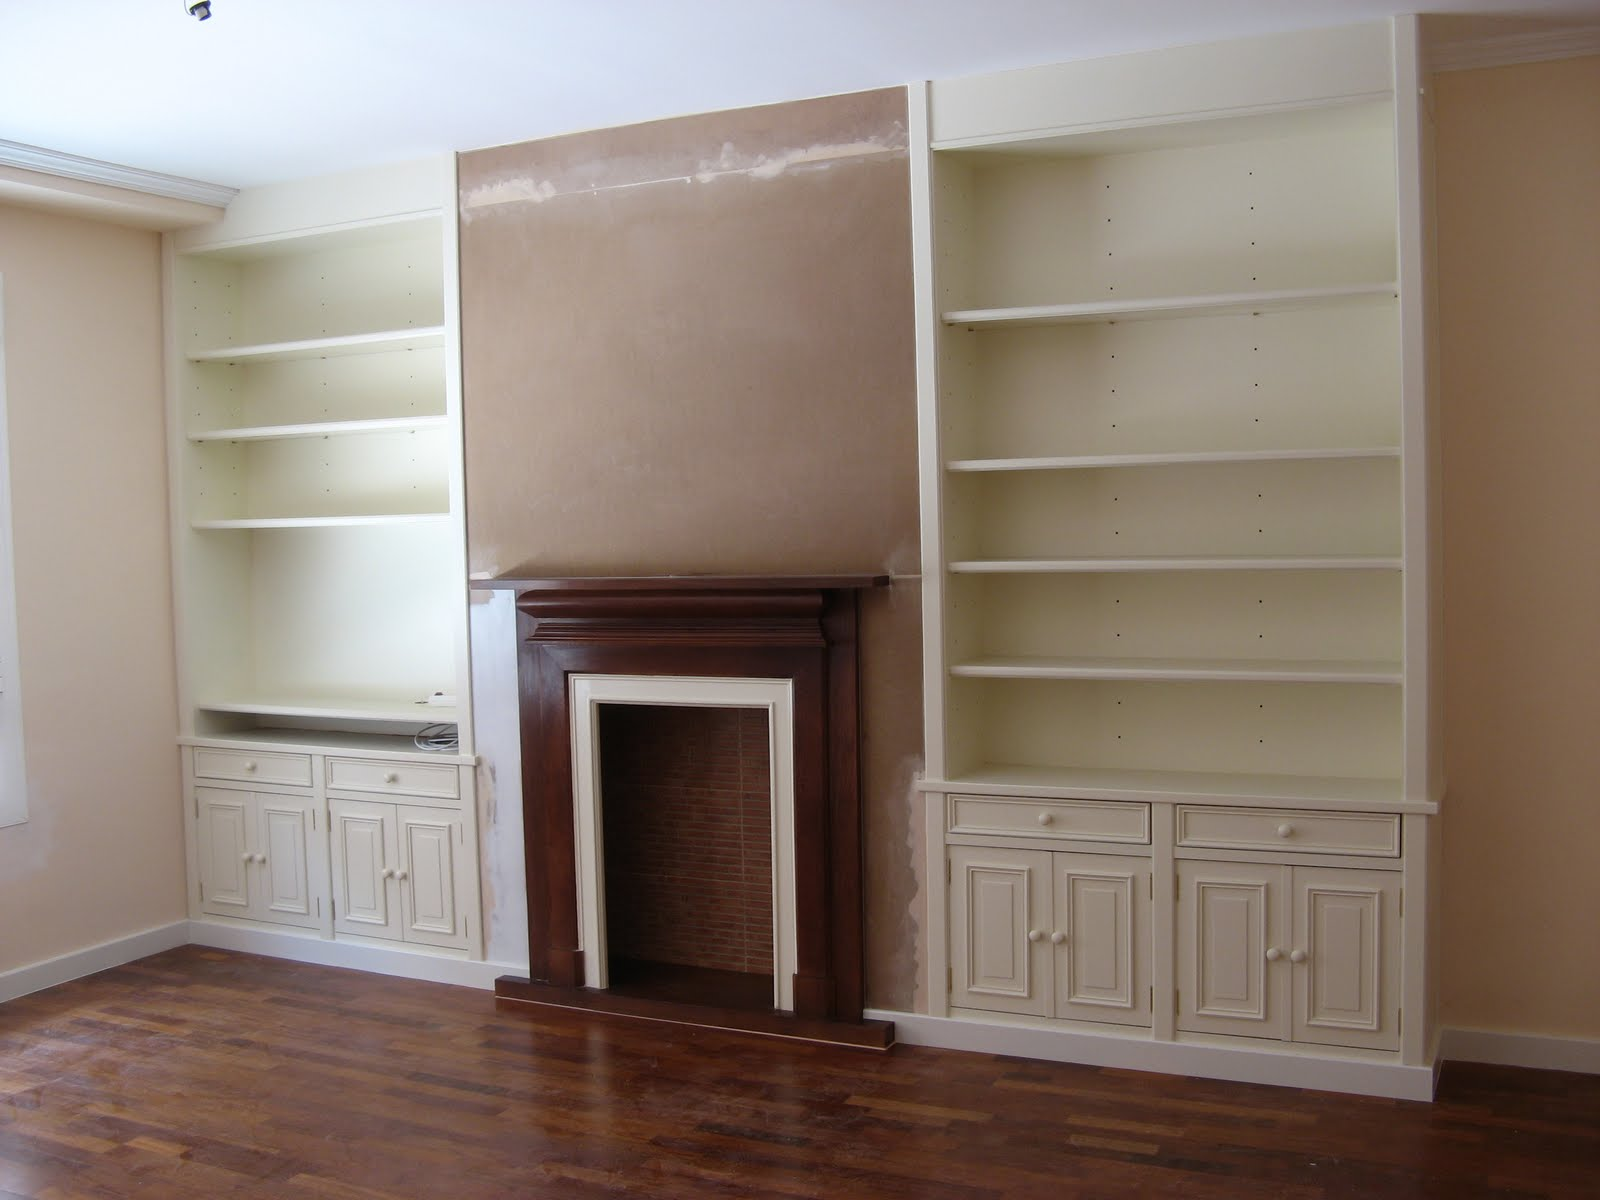 Librerias con chimenea - Librerias lacadas ...